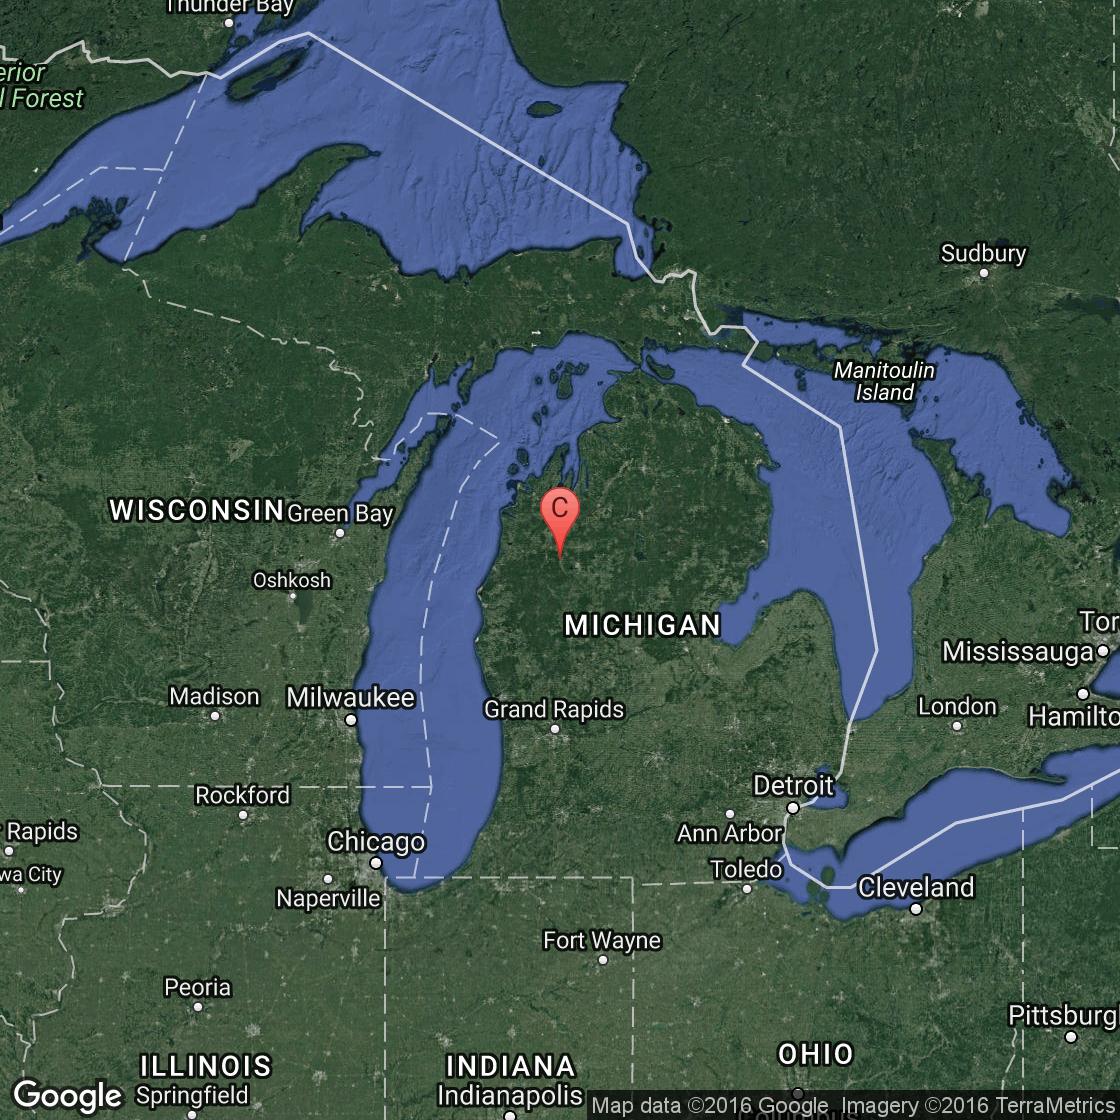 Worksheet. Michigan Ski Resorts Near Detroit  USA Today